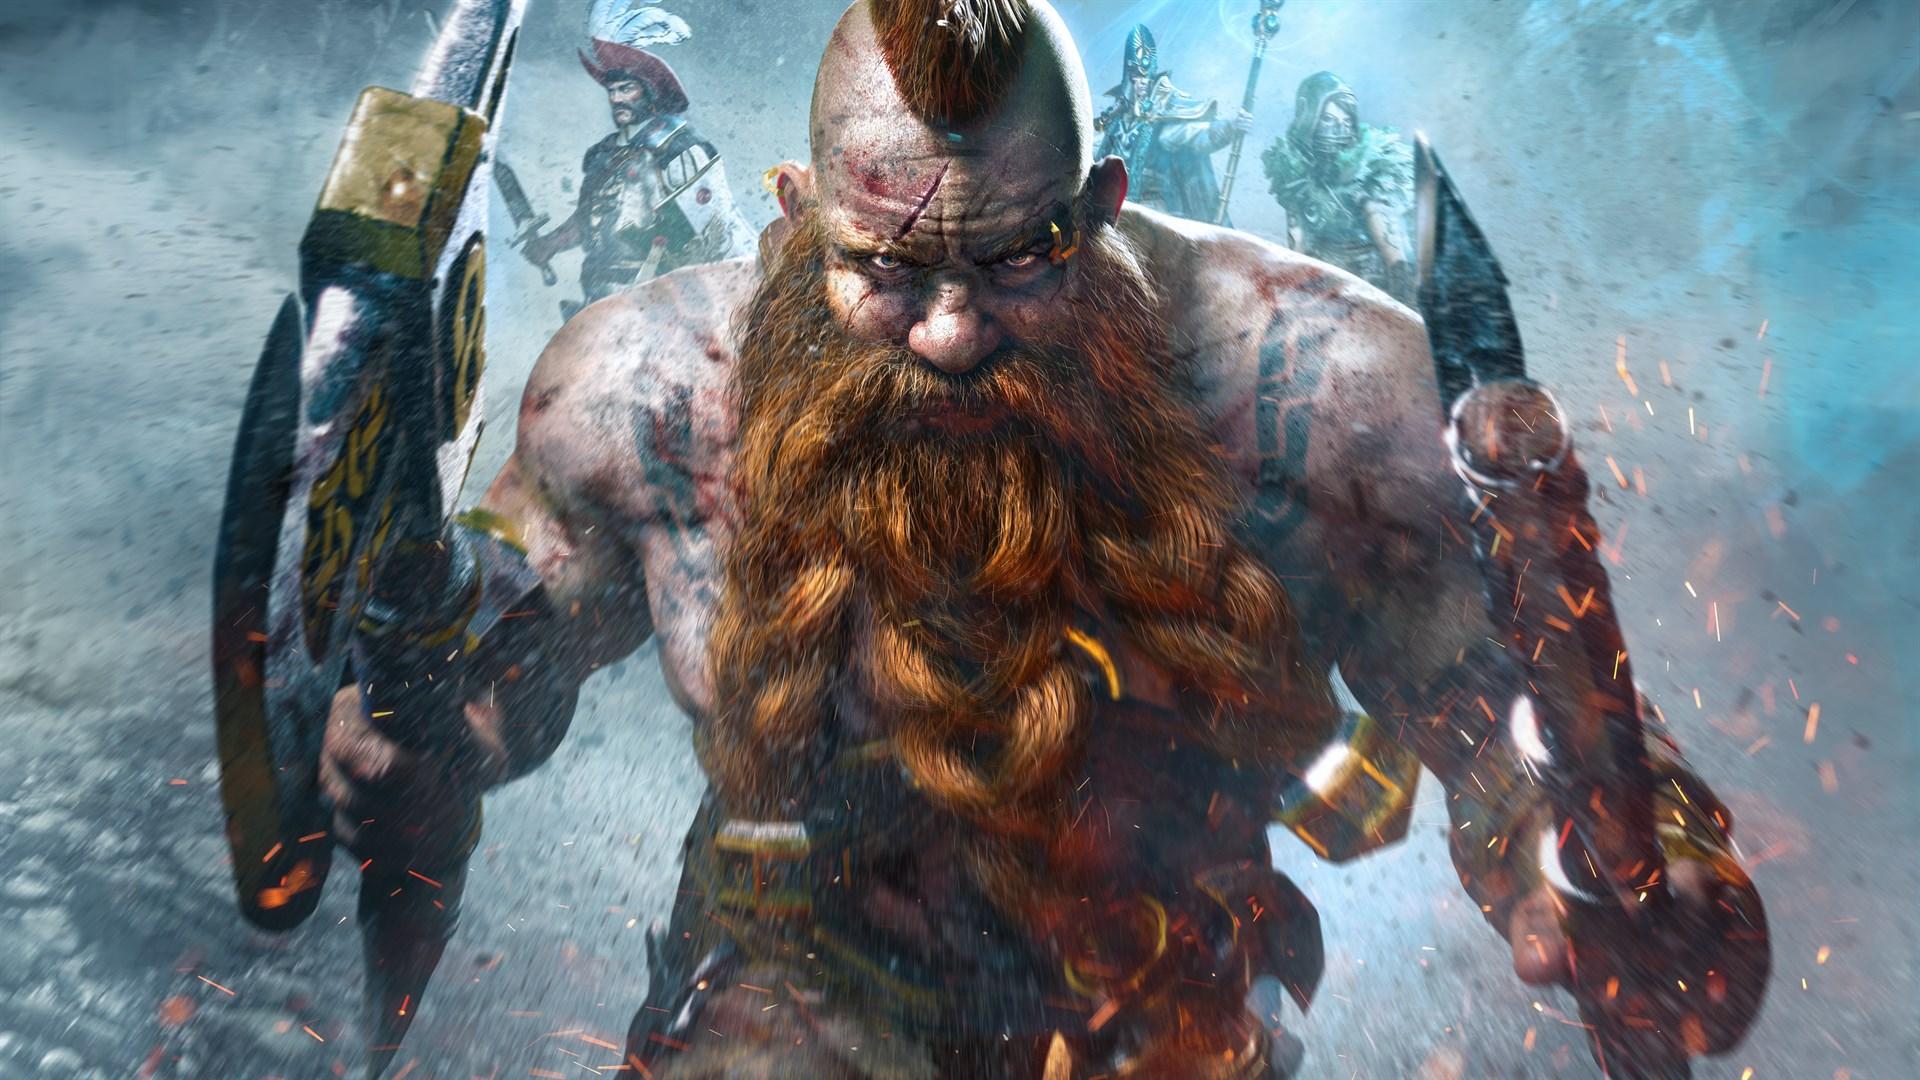 Игры Xbox Live Gold в сентябре: Zone of the Enders, Warhammer: Chaosbane и другие